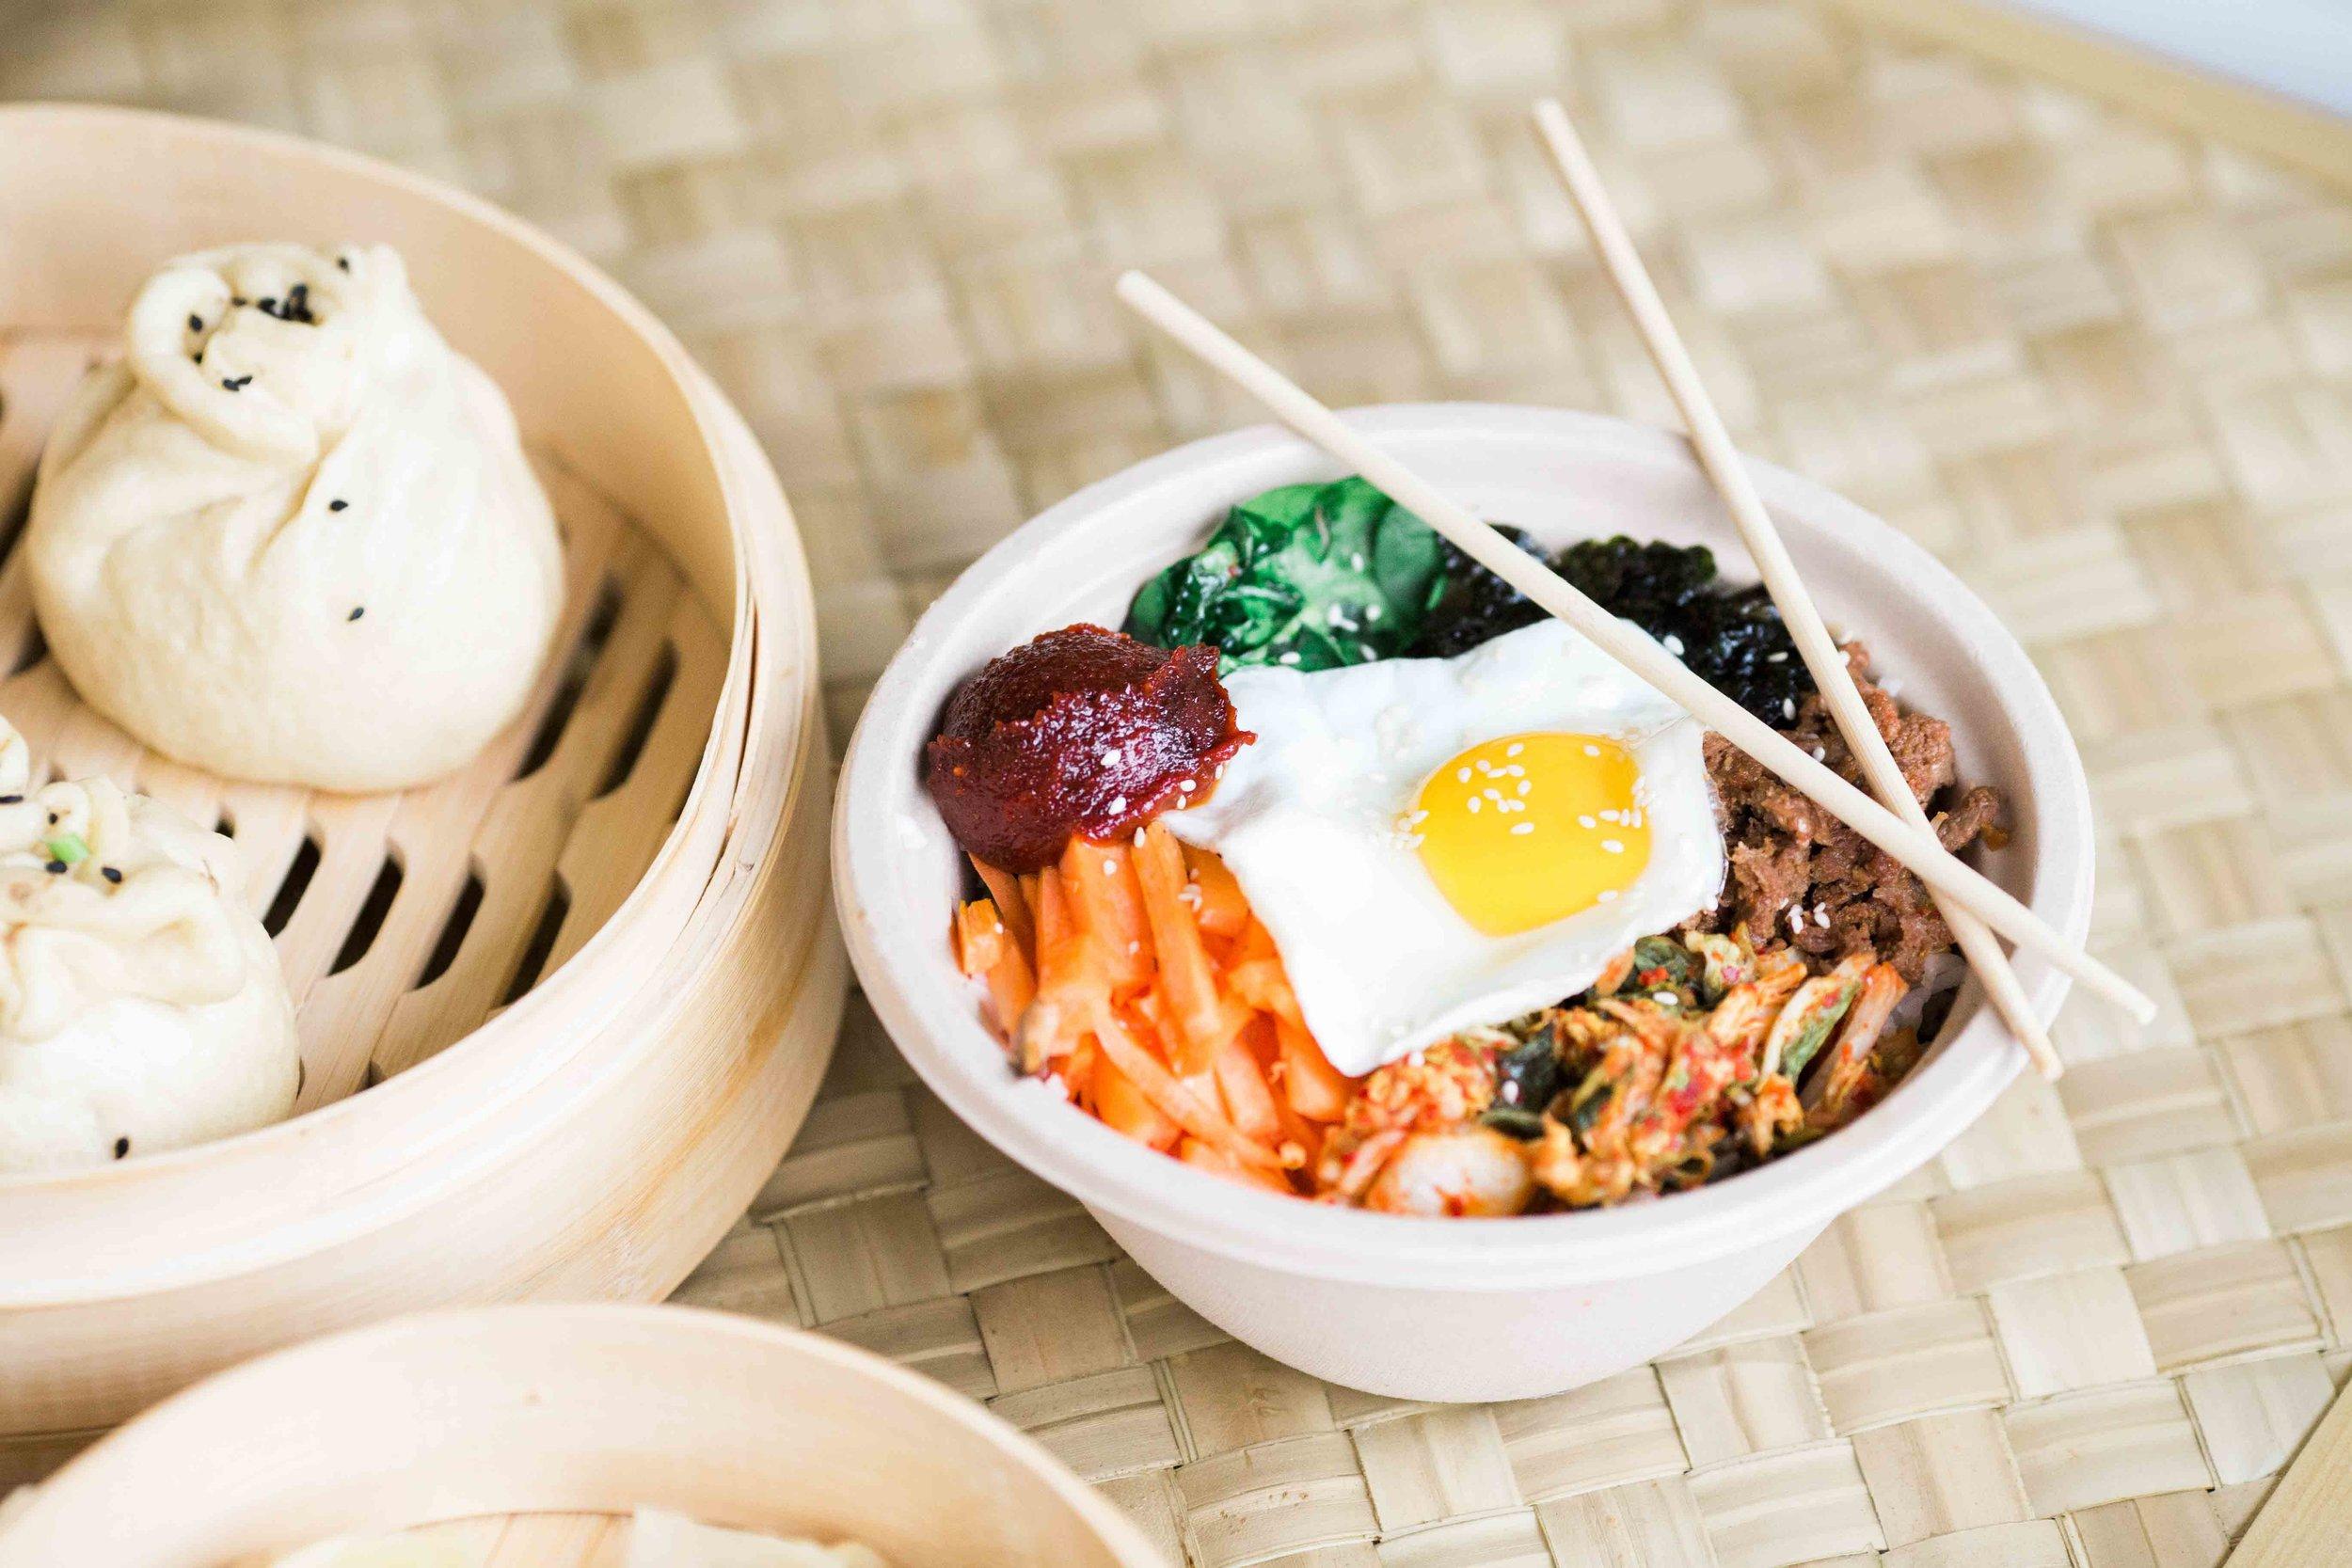 Dumpling-Darling-bao-buns-food-bowl.jpg